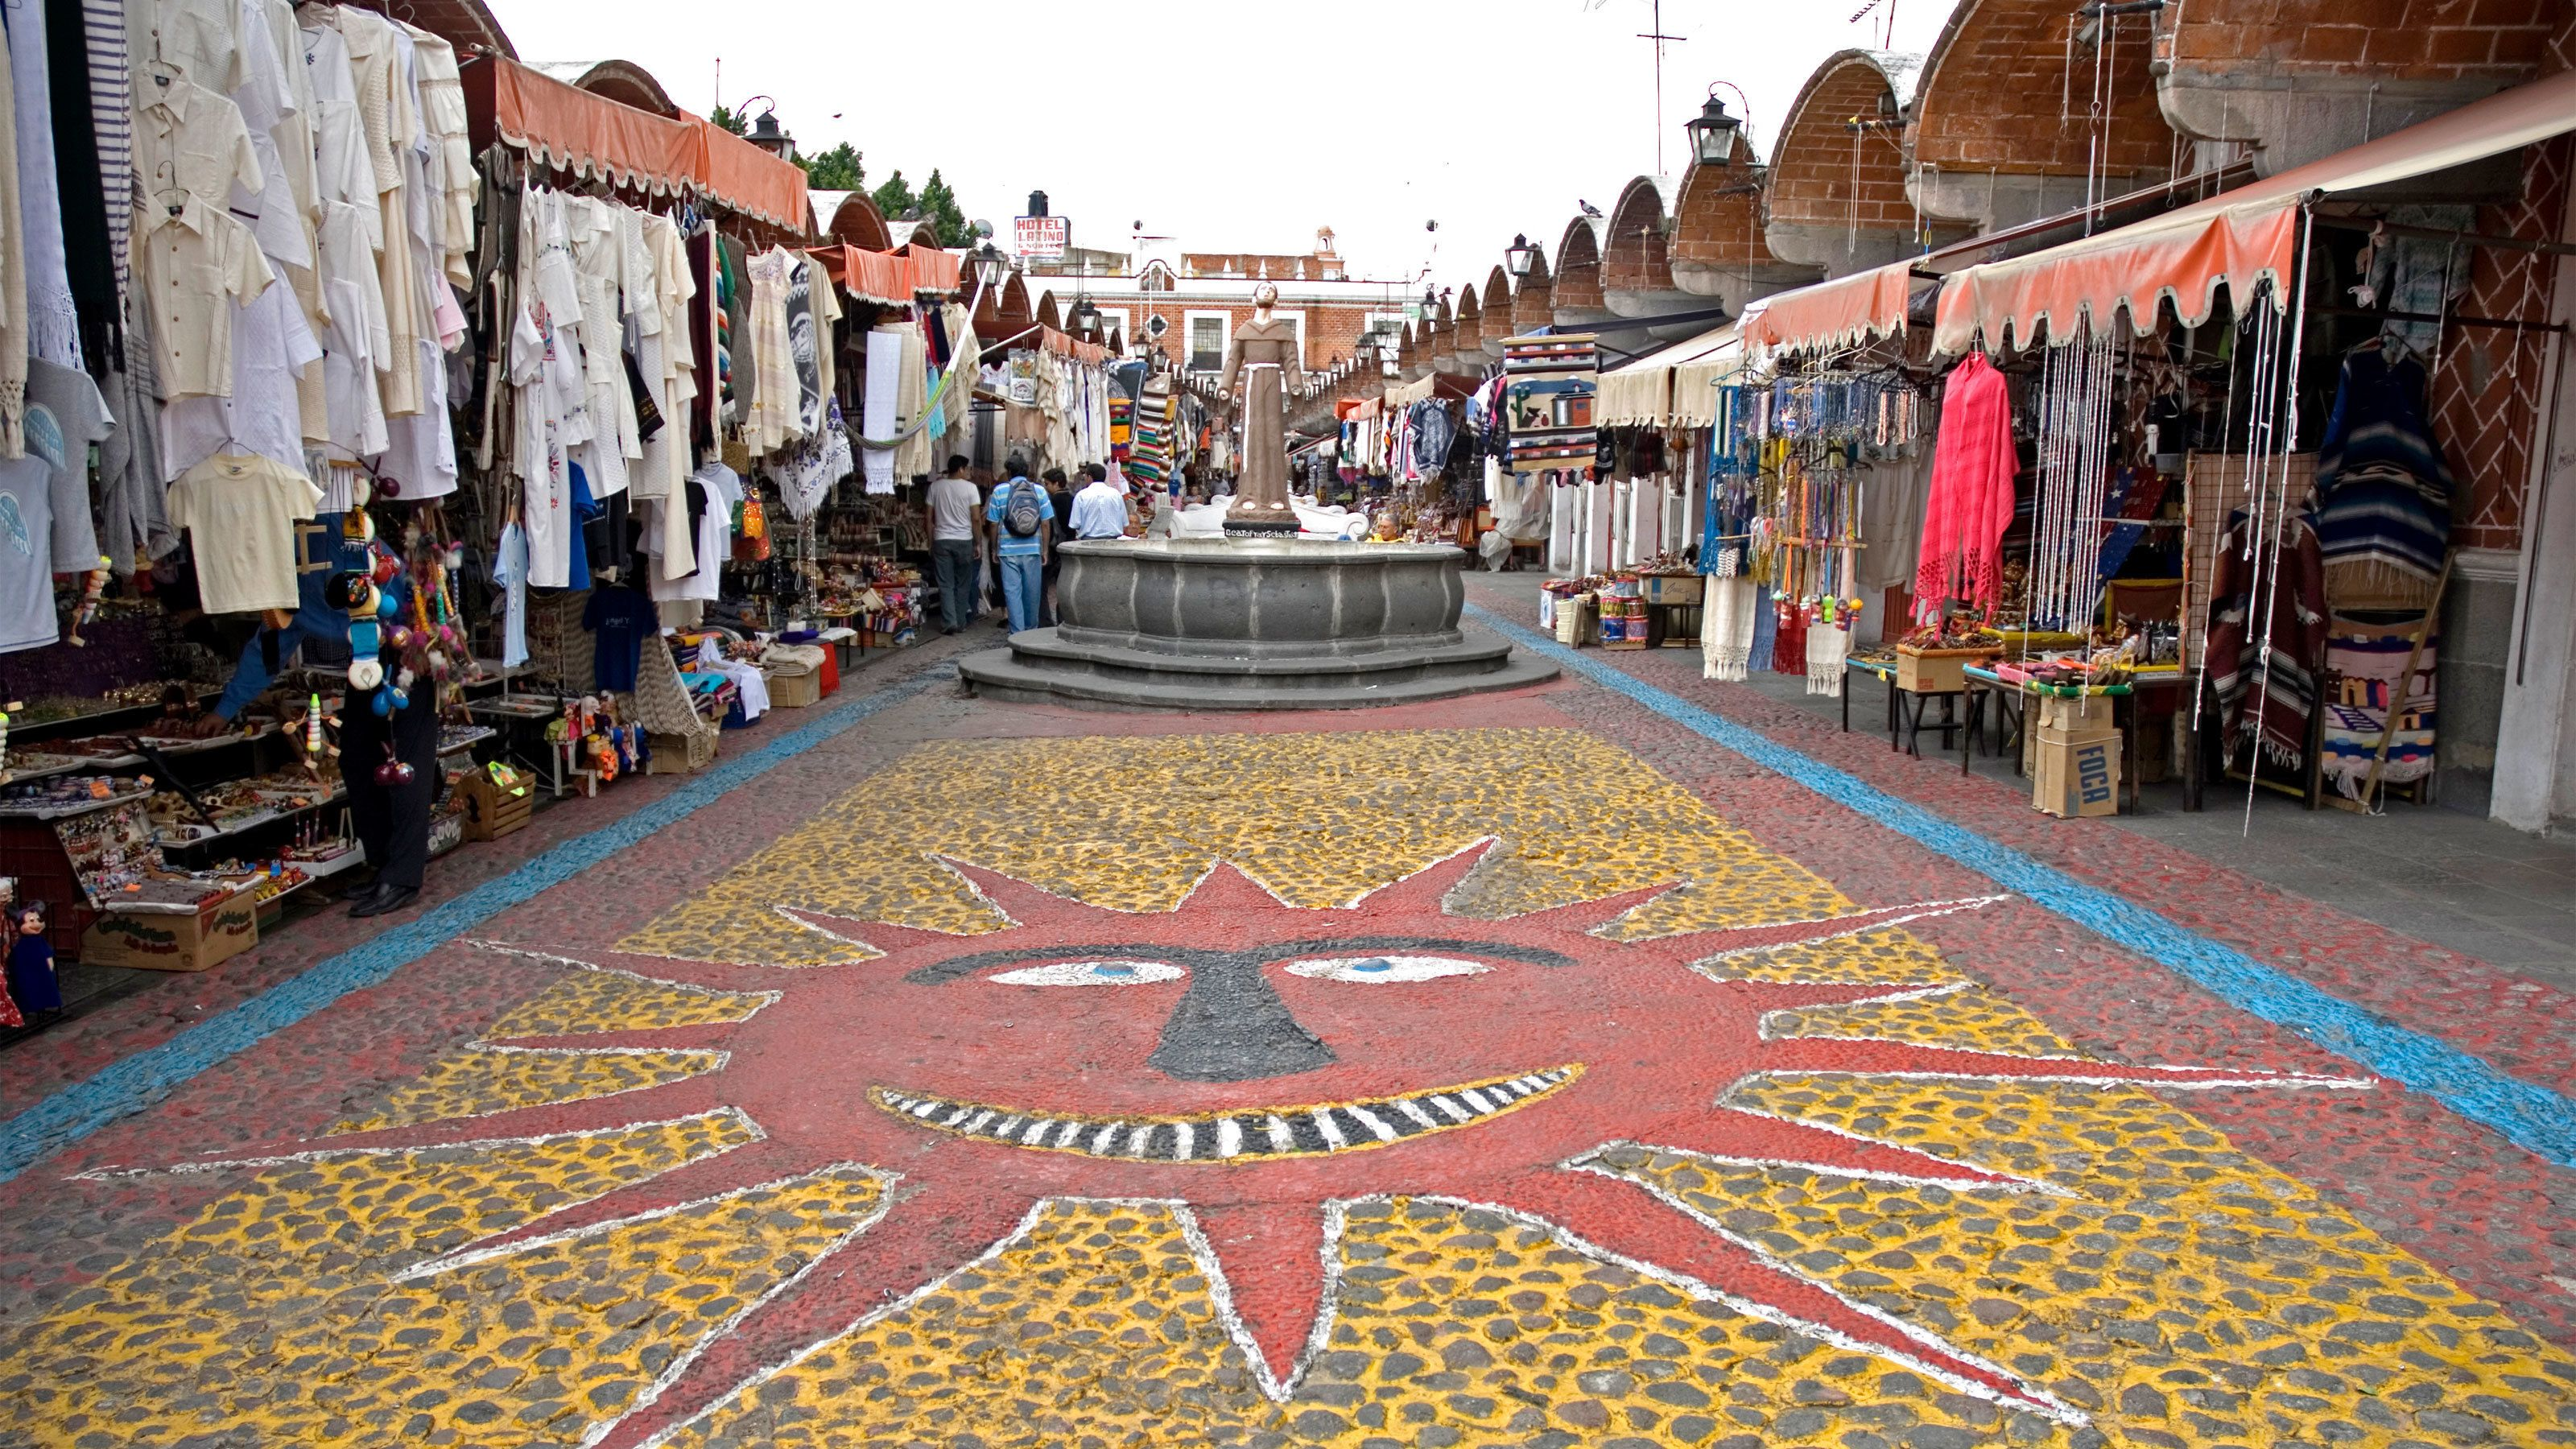 Street view of Puebla